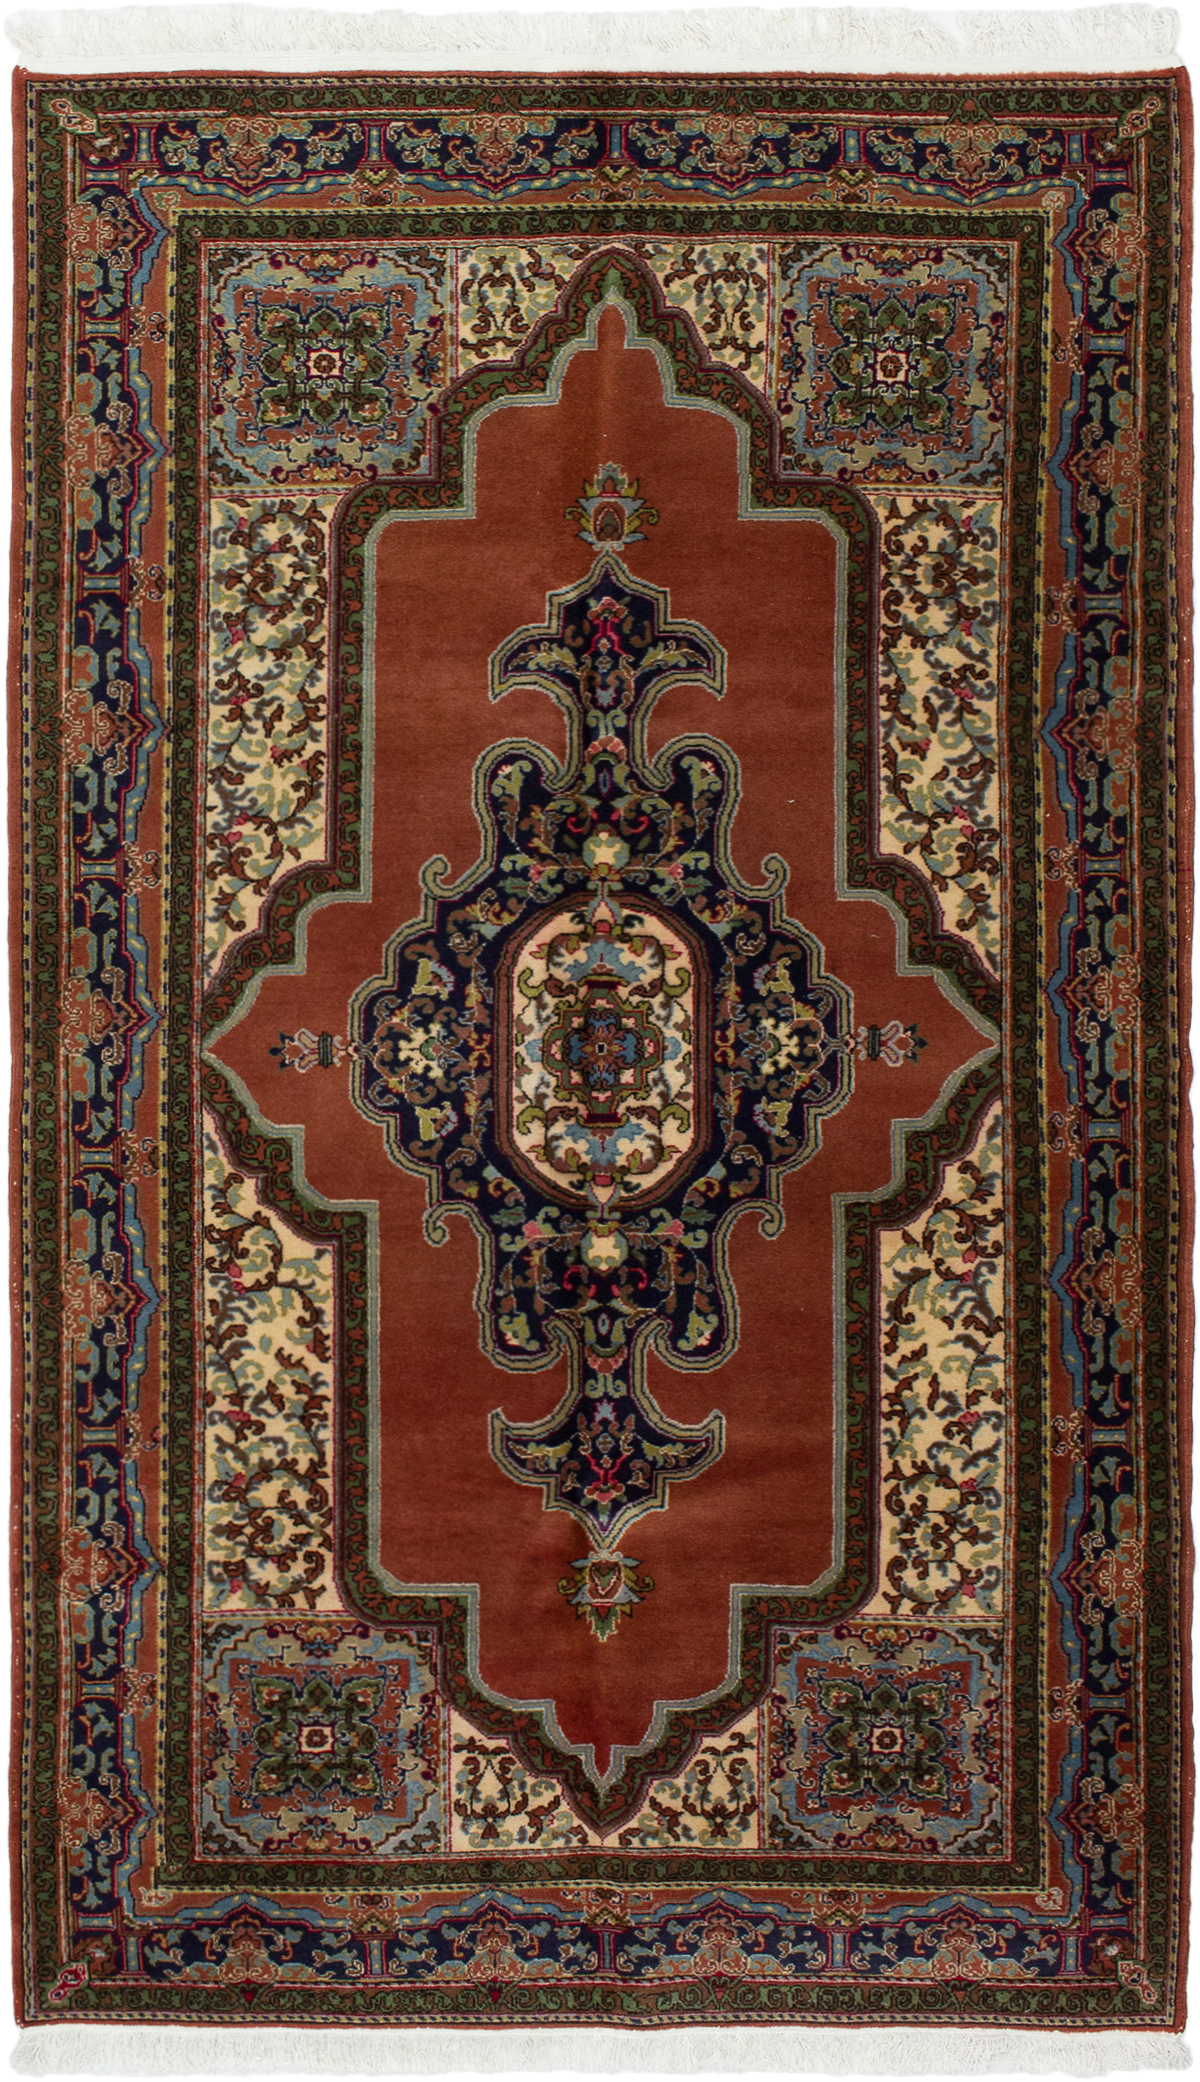 "Hand-knotted Hereke Dark Copper Wool Rug 5'5"" x 8'9"" Size: 5'5"" x 8'9"""